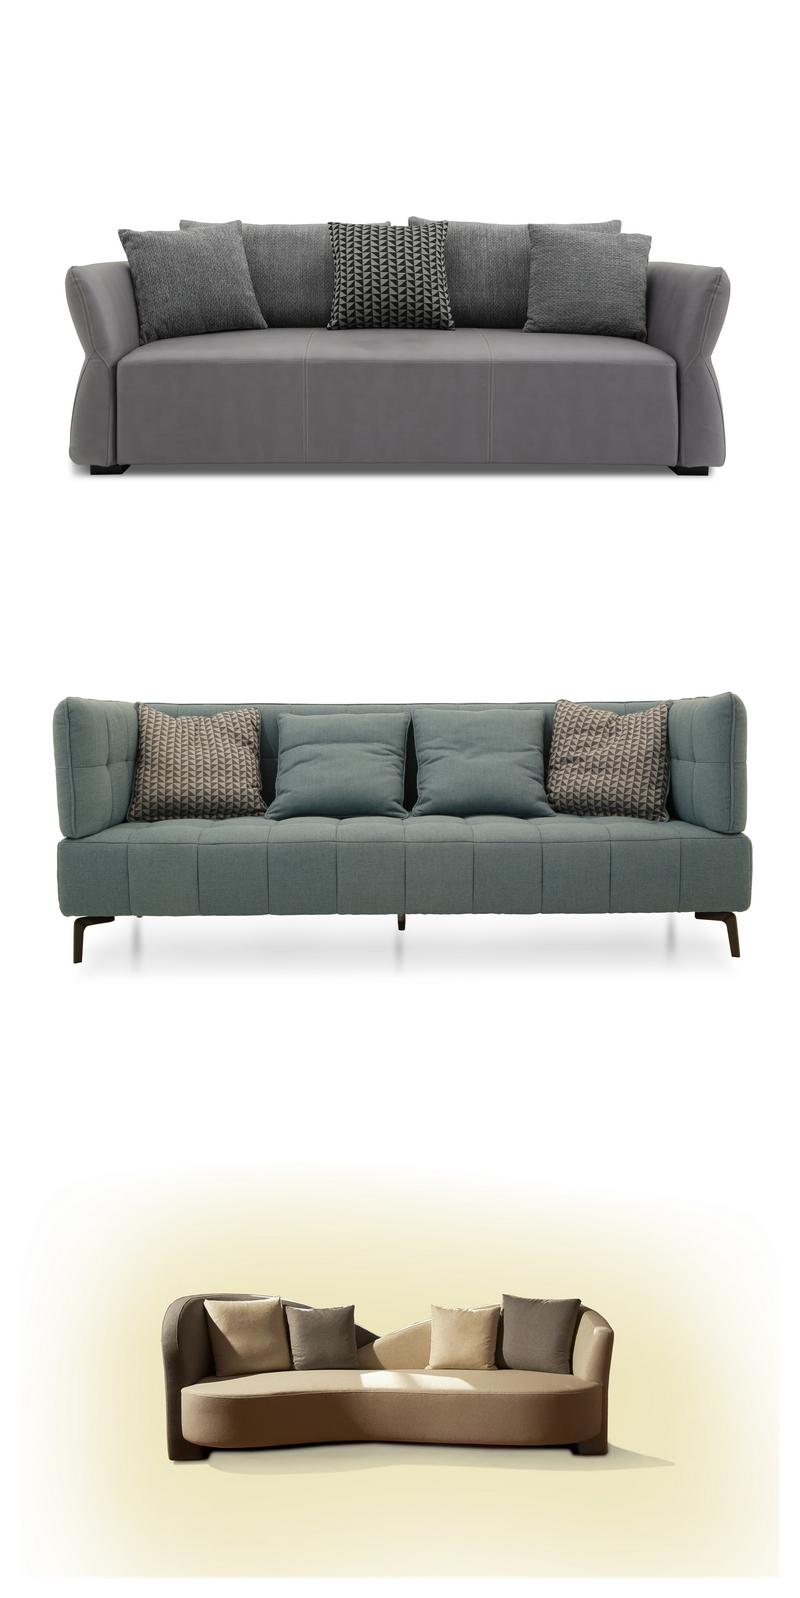 Pin By Yanrong Wu On Sofa Sofa Manufacturers Modern Sofa Set Sofa Set